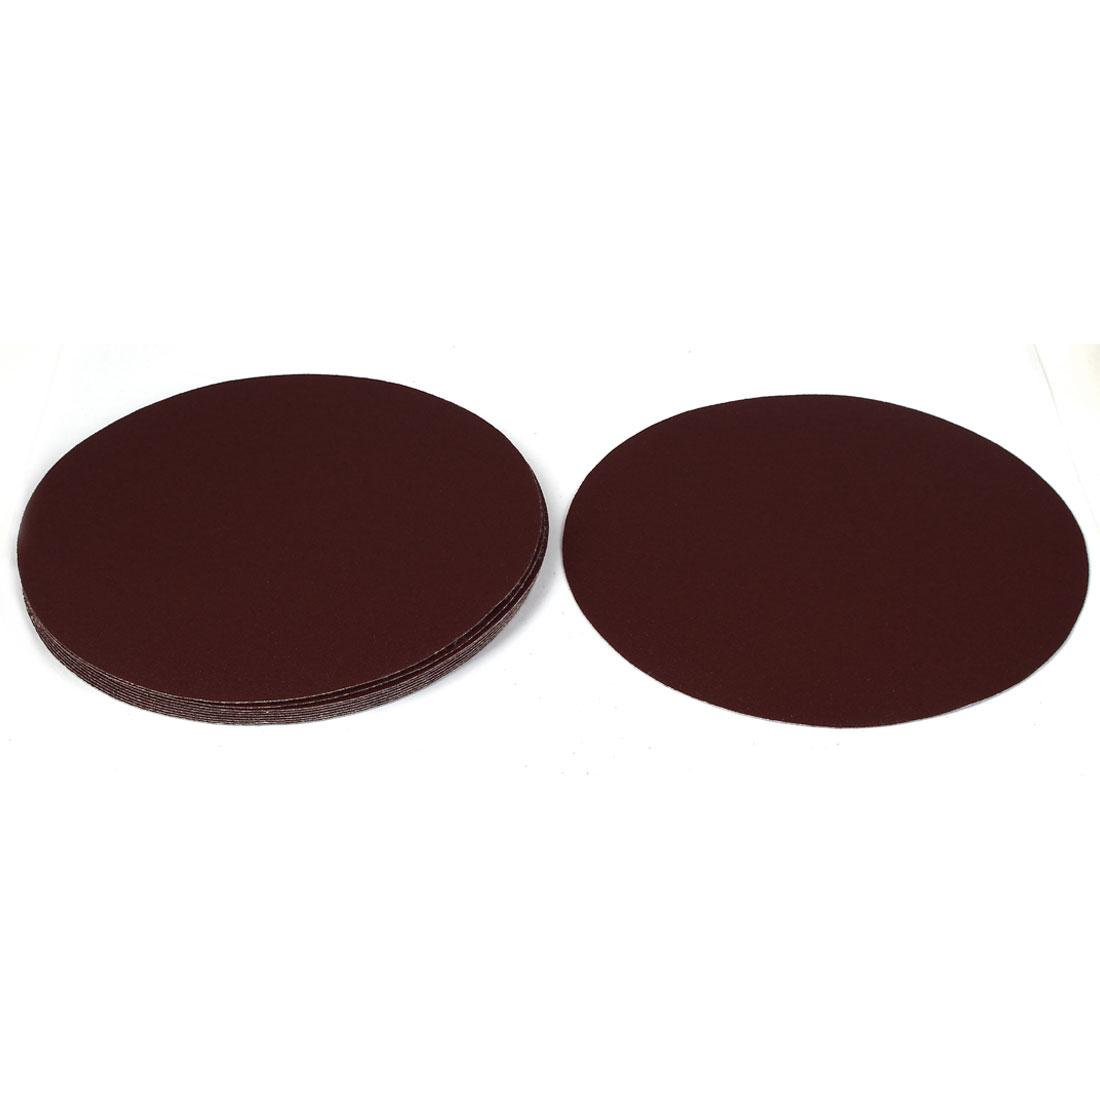 "8"" Dia Polishing Round Abrasive Sanding Sandpaper Sheet Disc 100 Grit 10 Pcs"